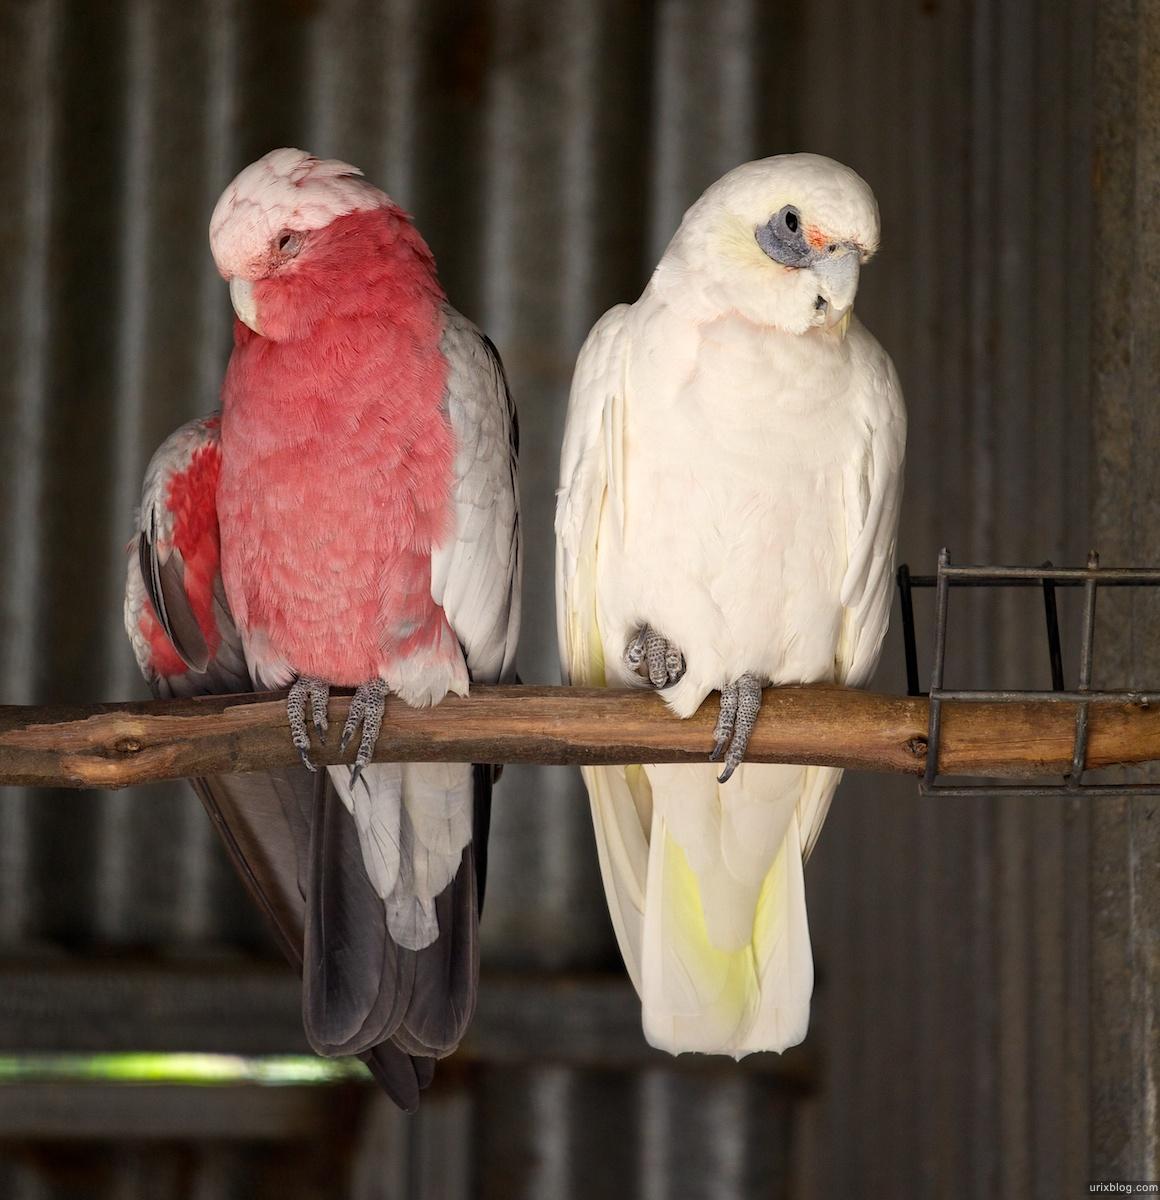 2011 South Australia, Kangaroo Island, Остров Кенгуру, Южная Австралия, Parndana Wildlife Park, parrot, попугай